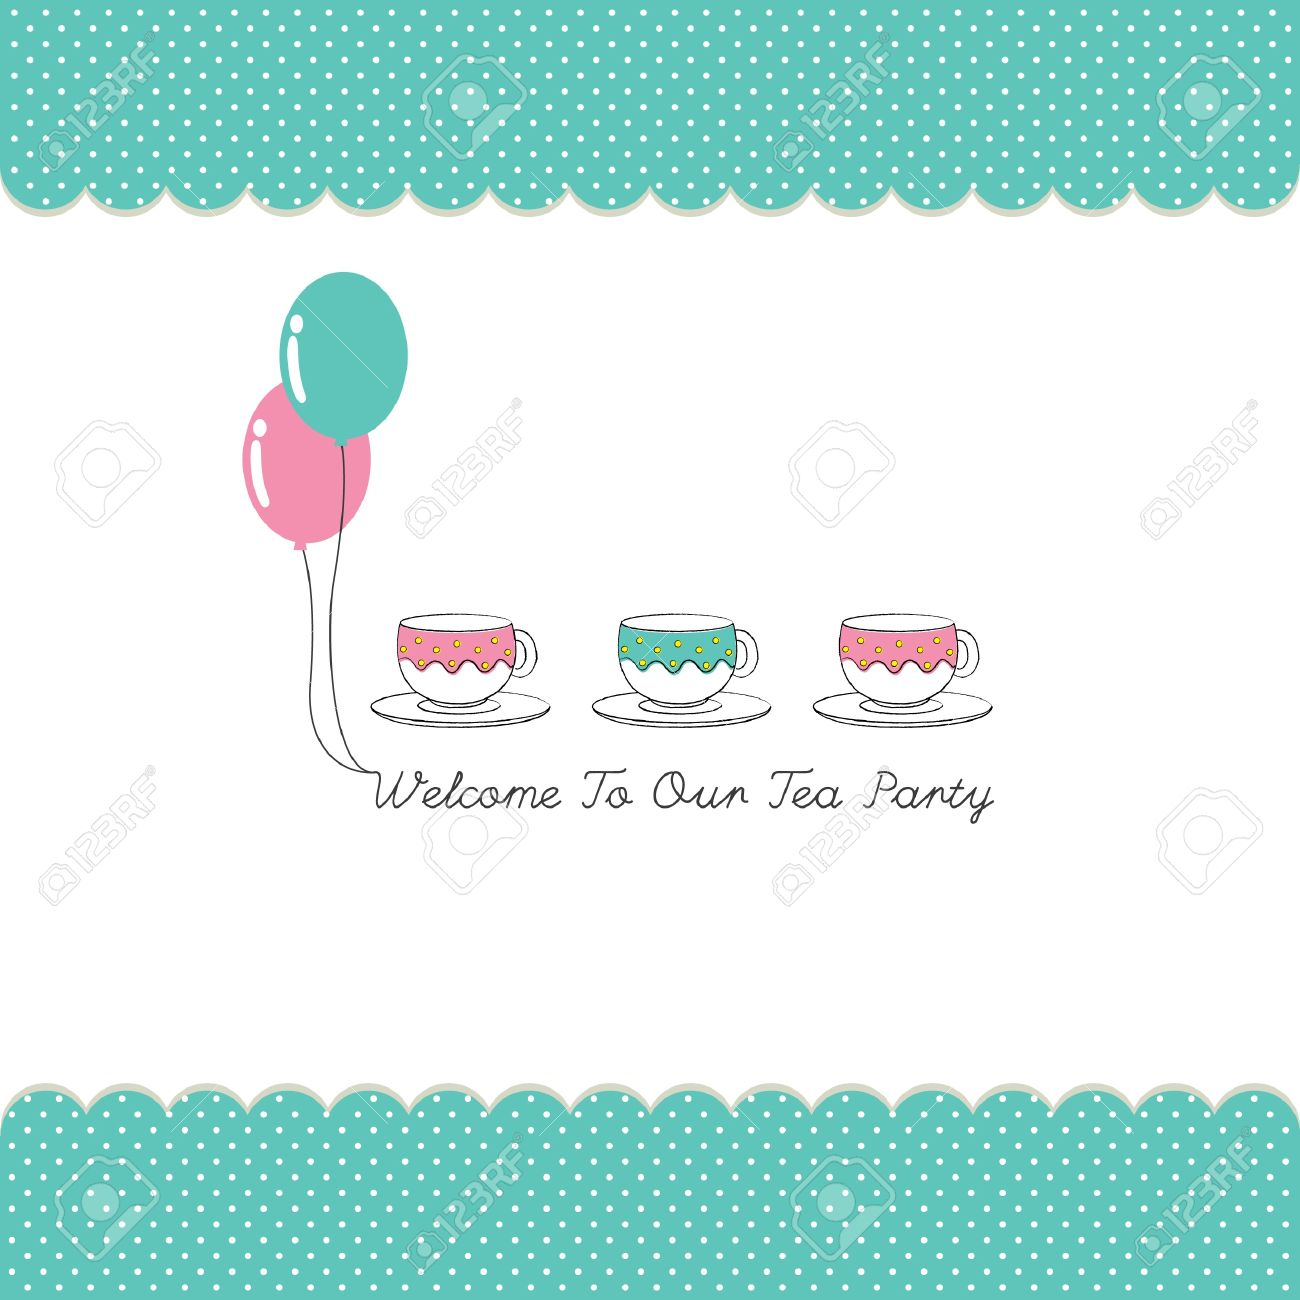 Cute Tea Party Invitation Card With Polka Dots Royalty Free ...